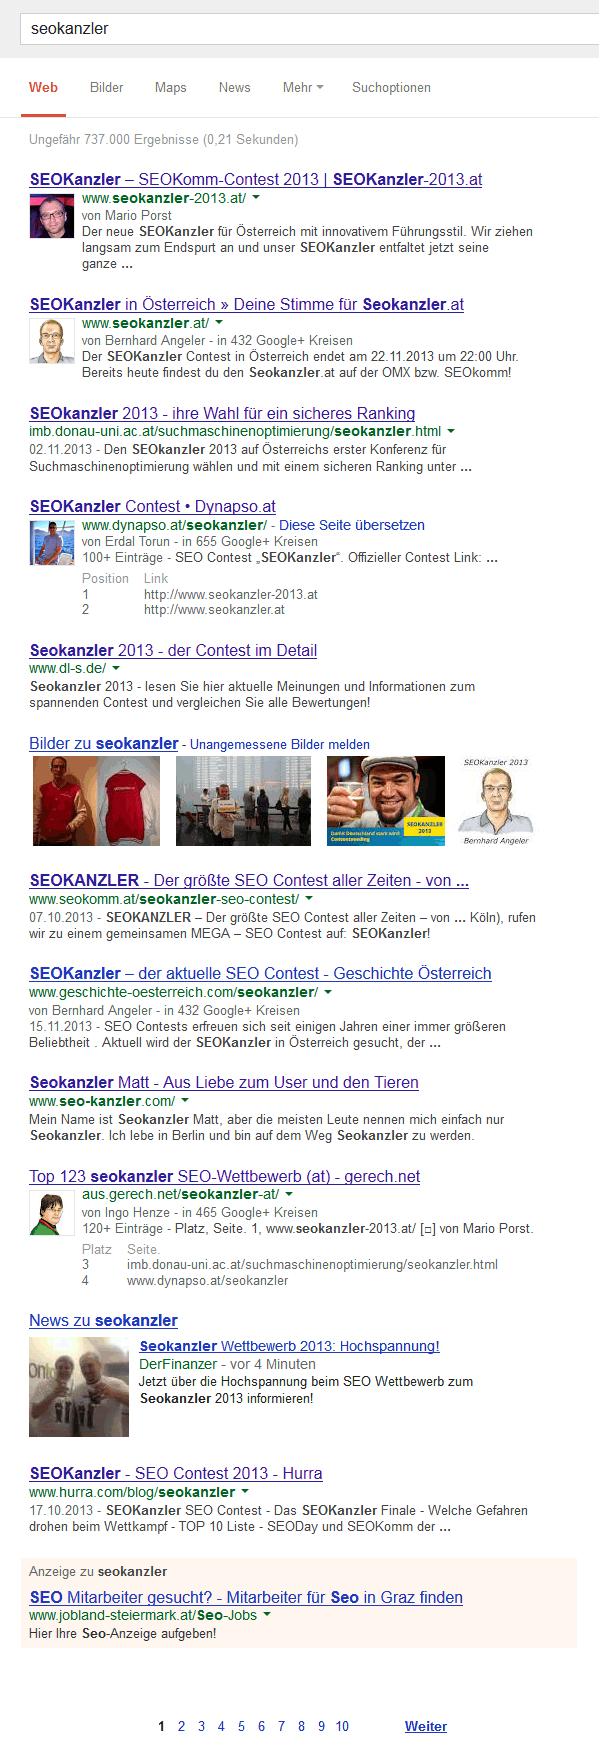 Seokanzler google.at – Zielfoto